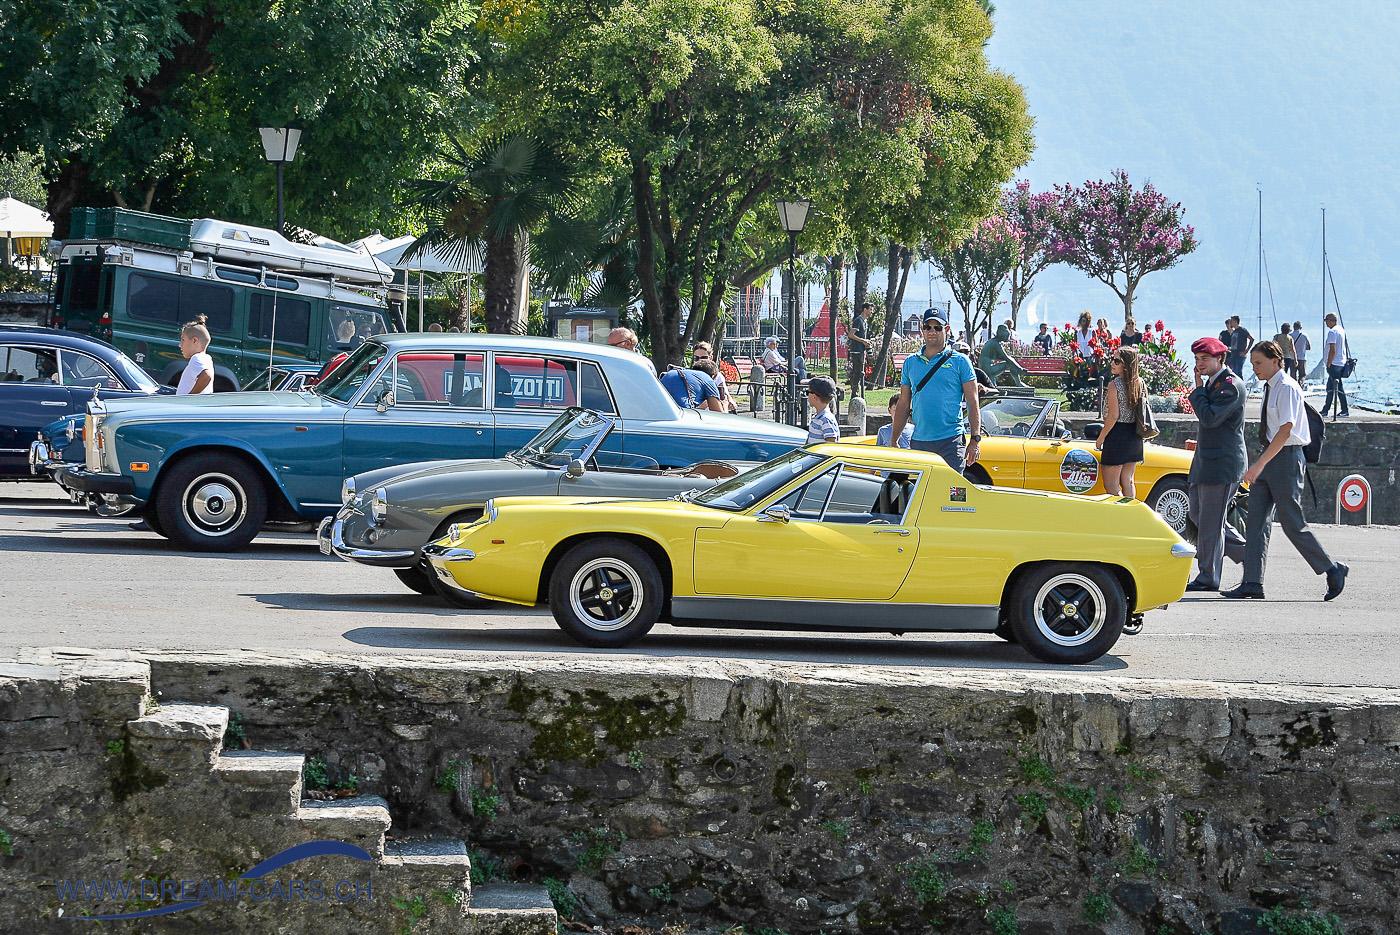 ACCA - Ascona Classic Car Award 2018, 23. September. Ein Lotus Europa an der Seepromenade